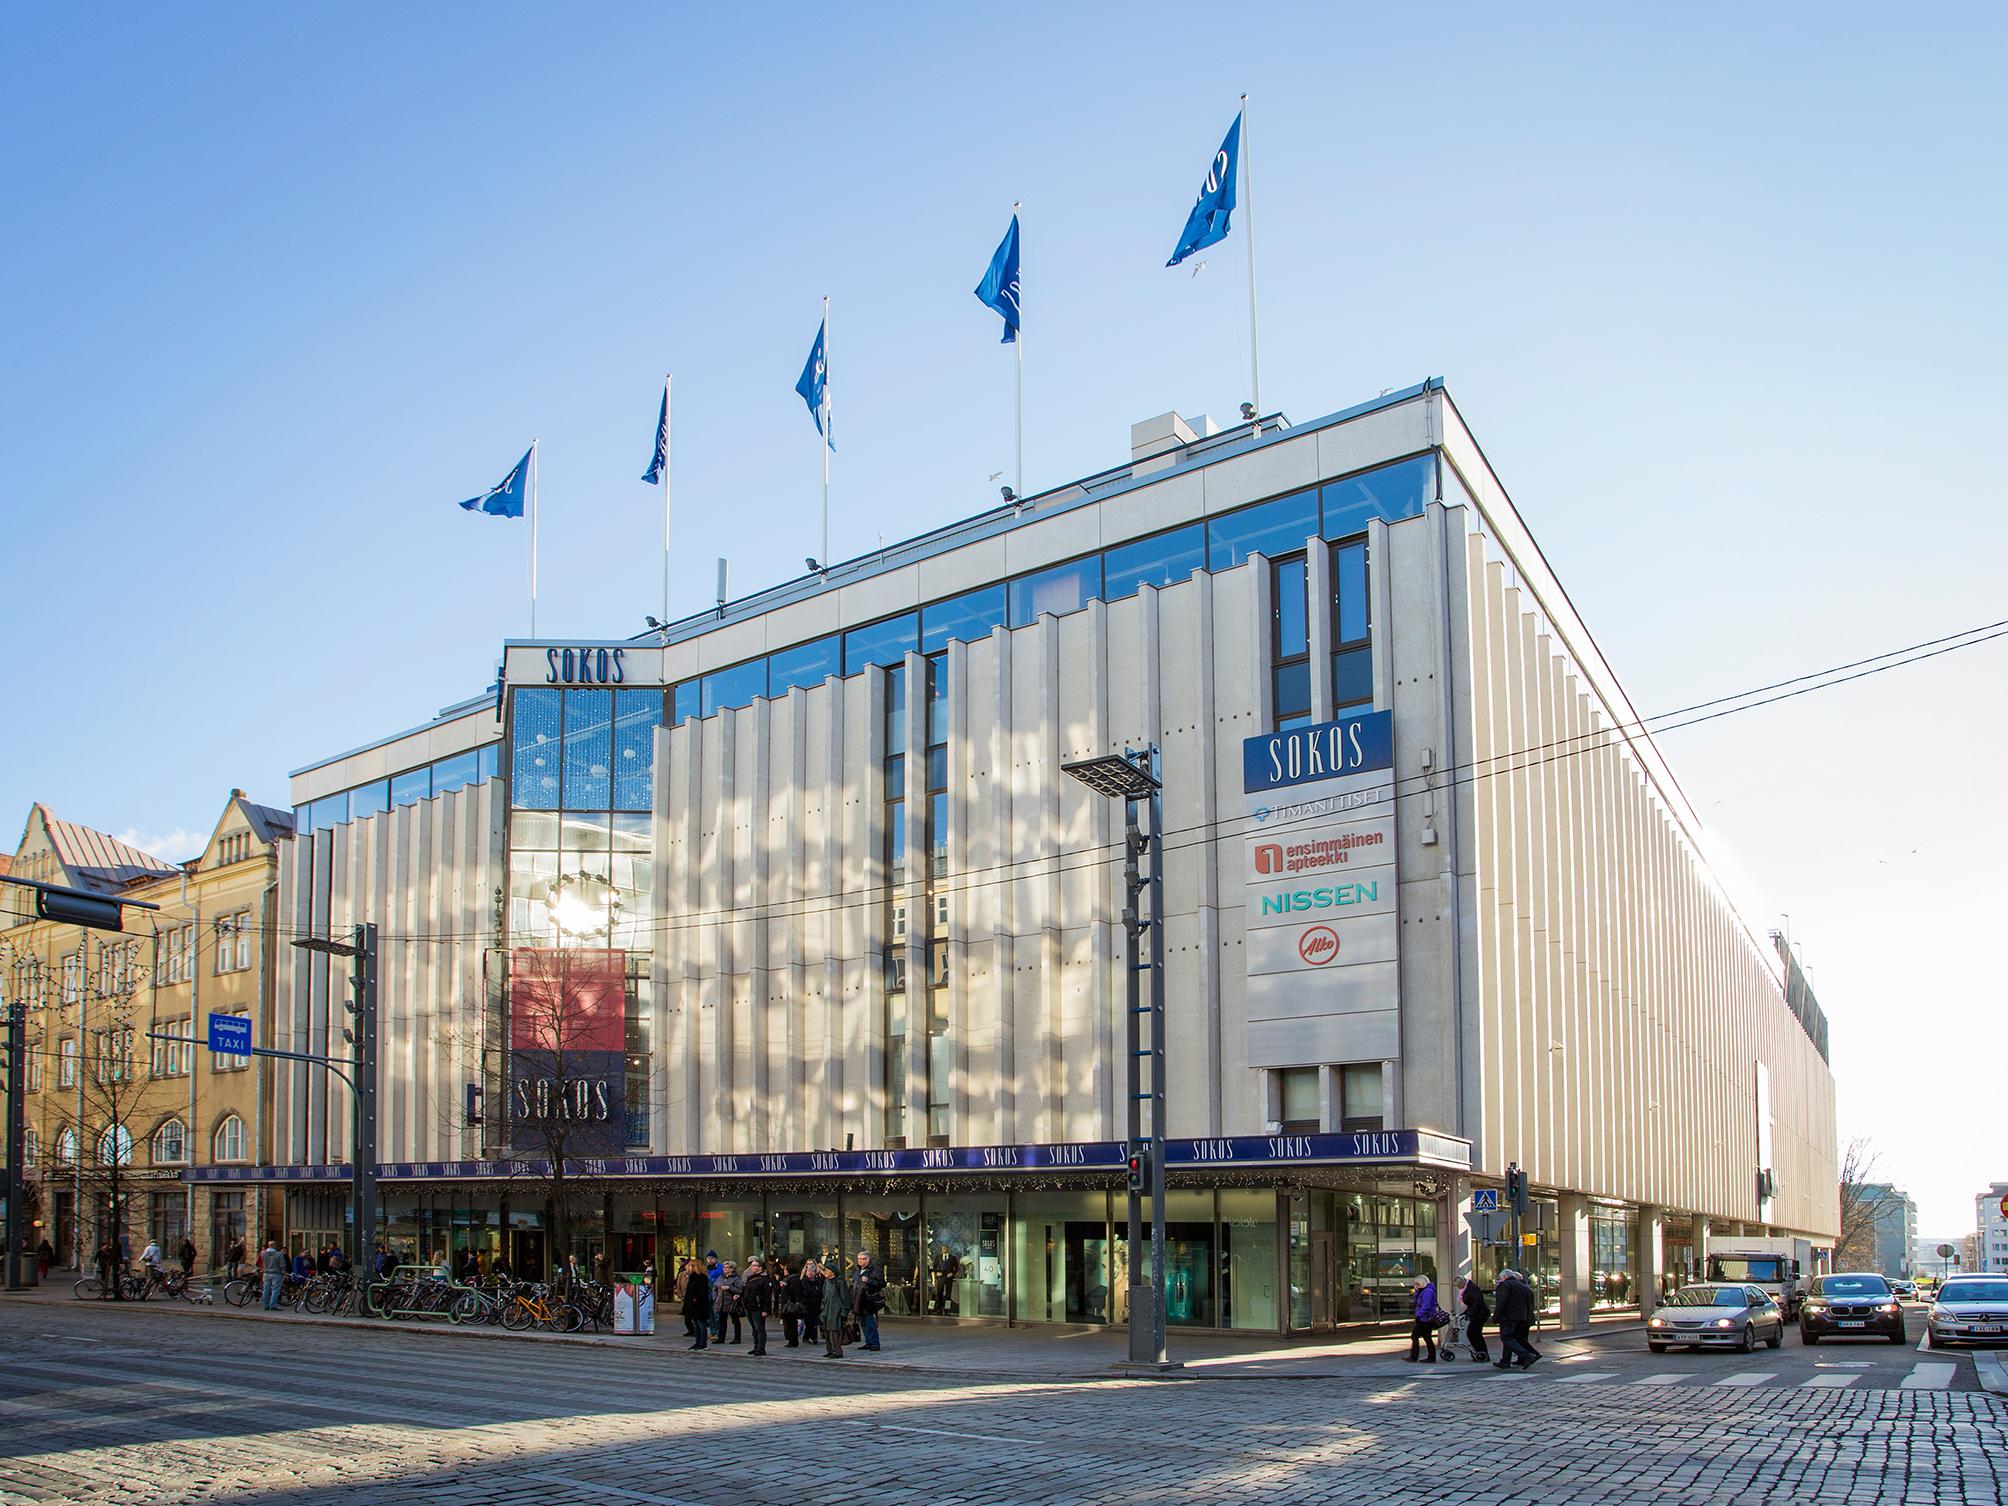 sokos joulu 2018 Sokos   Sokos Tampere sokos joulu 2018